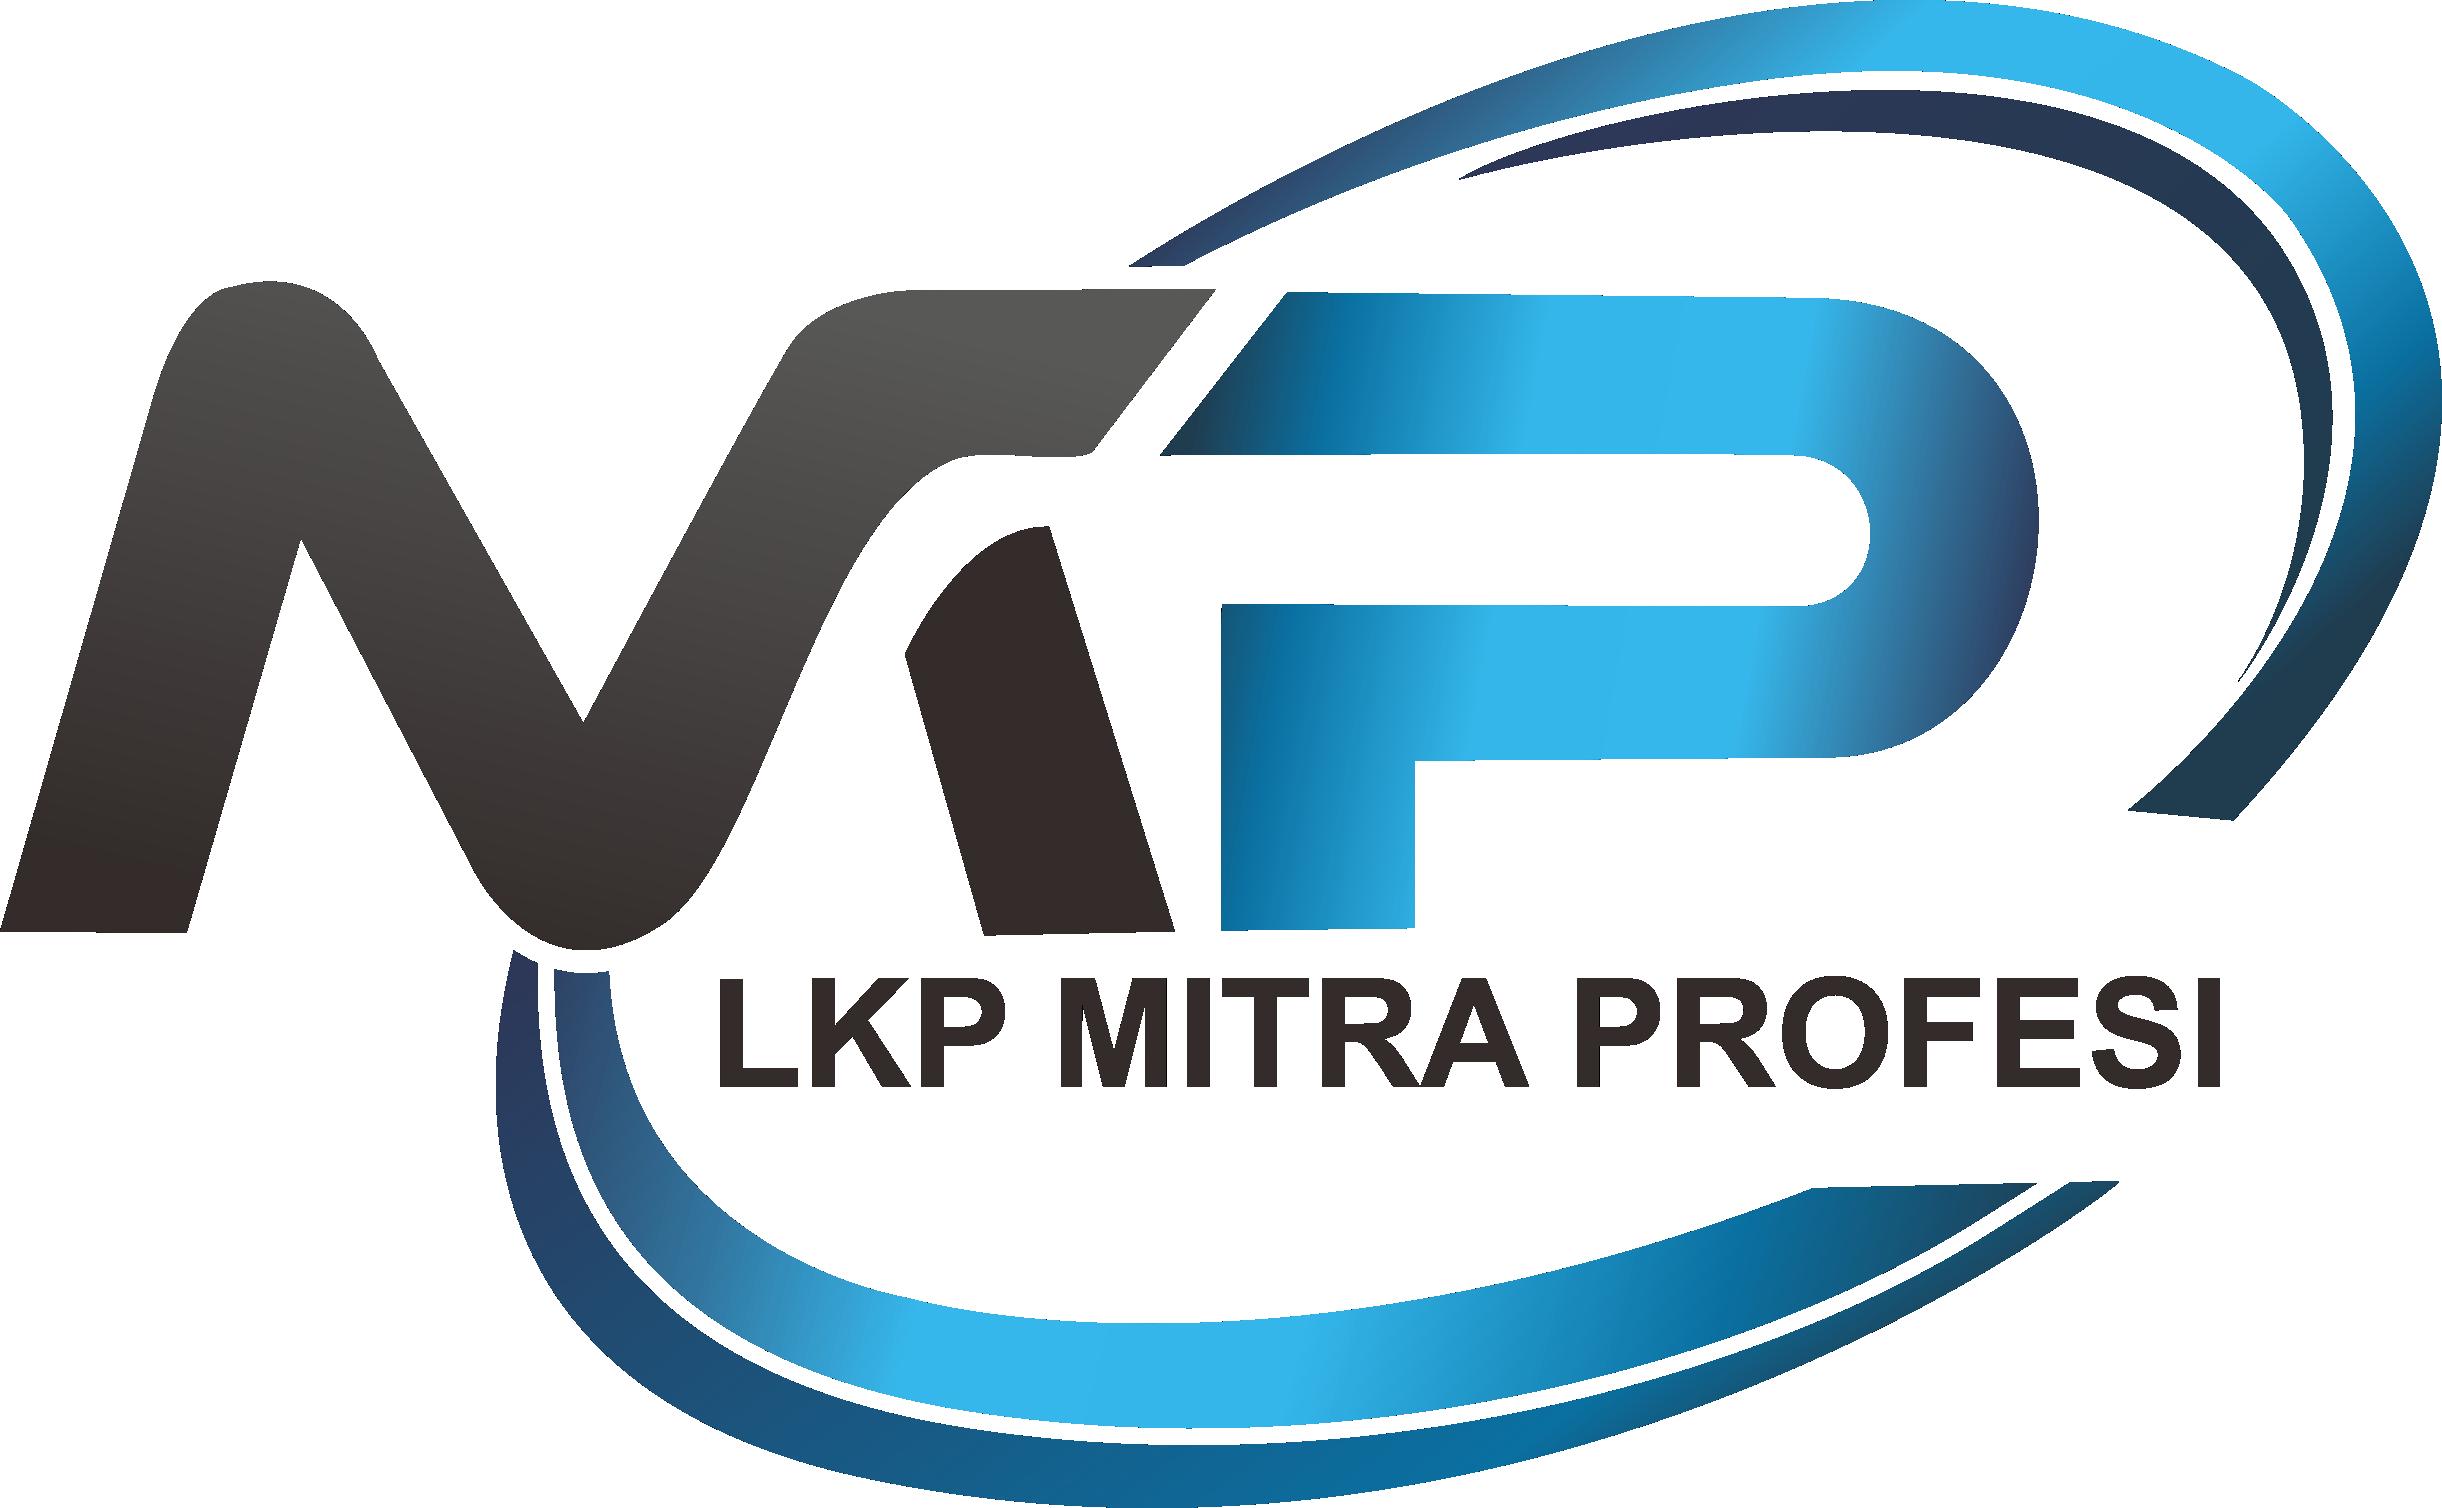 LKP Mitra Profesi